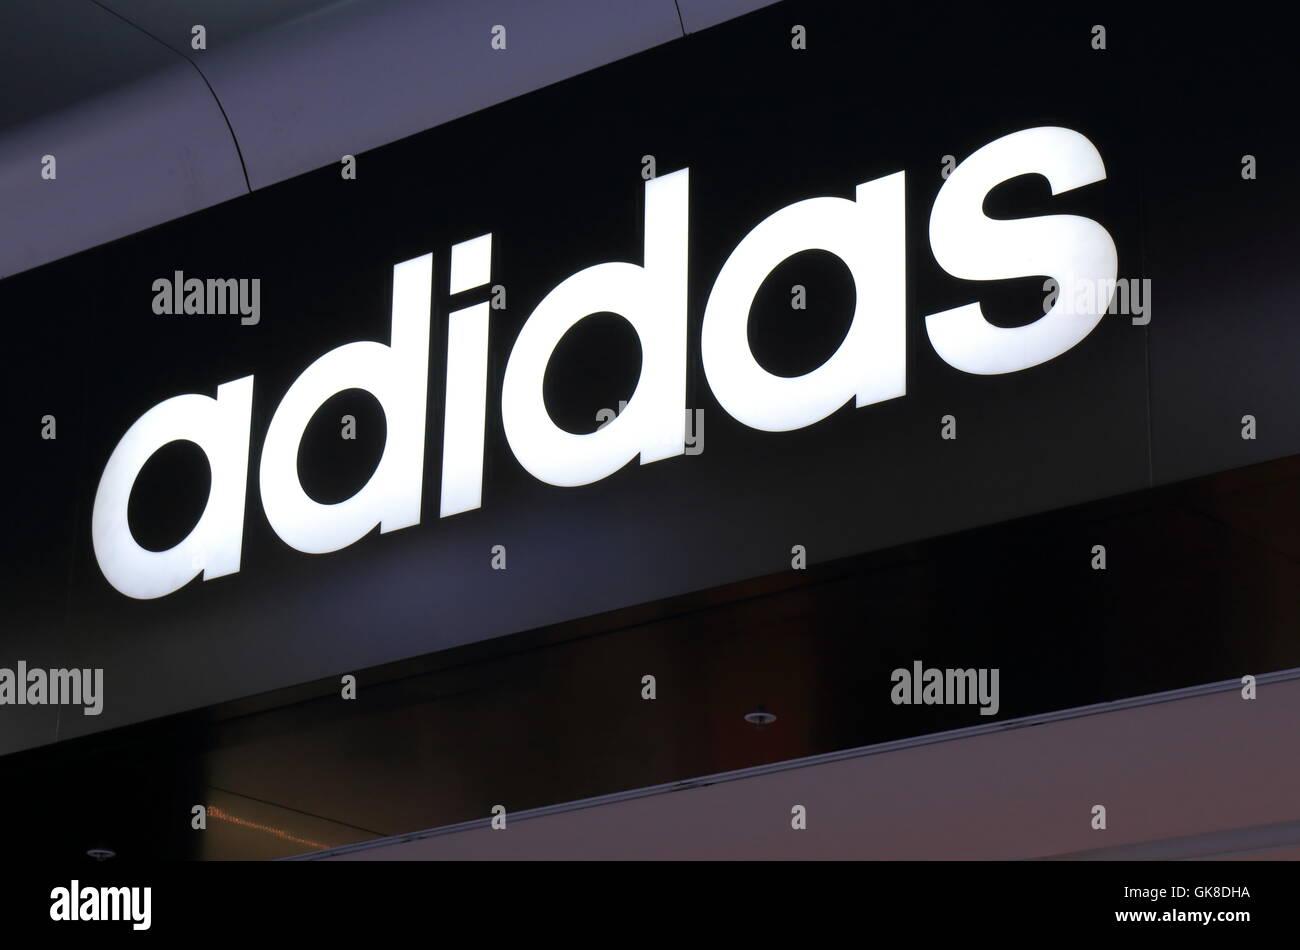 Fotos amp; Stock Immagini Alamy Adidas Logo fqYwF